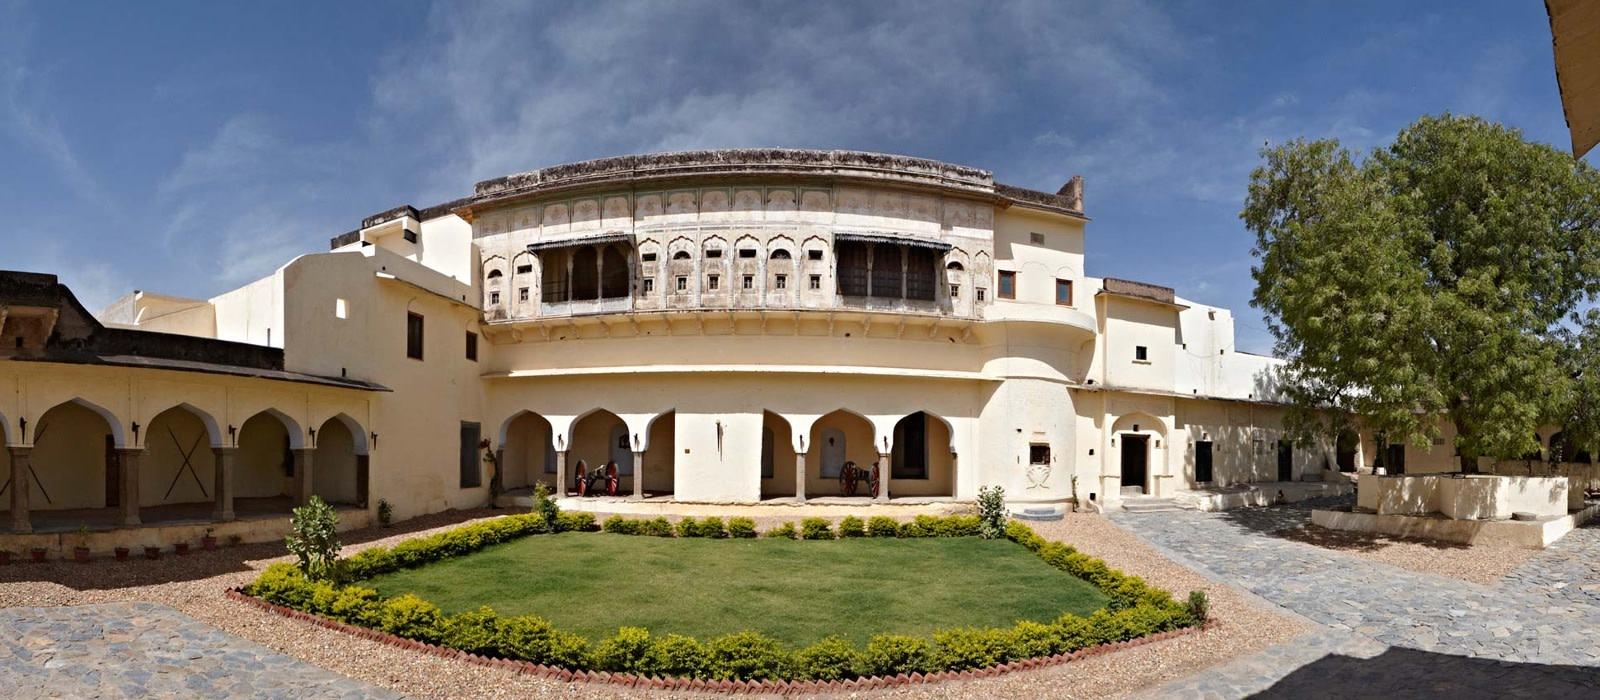 Hotel Fort Barli Nordindien